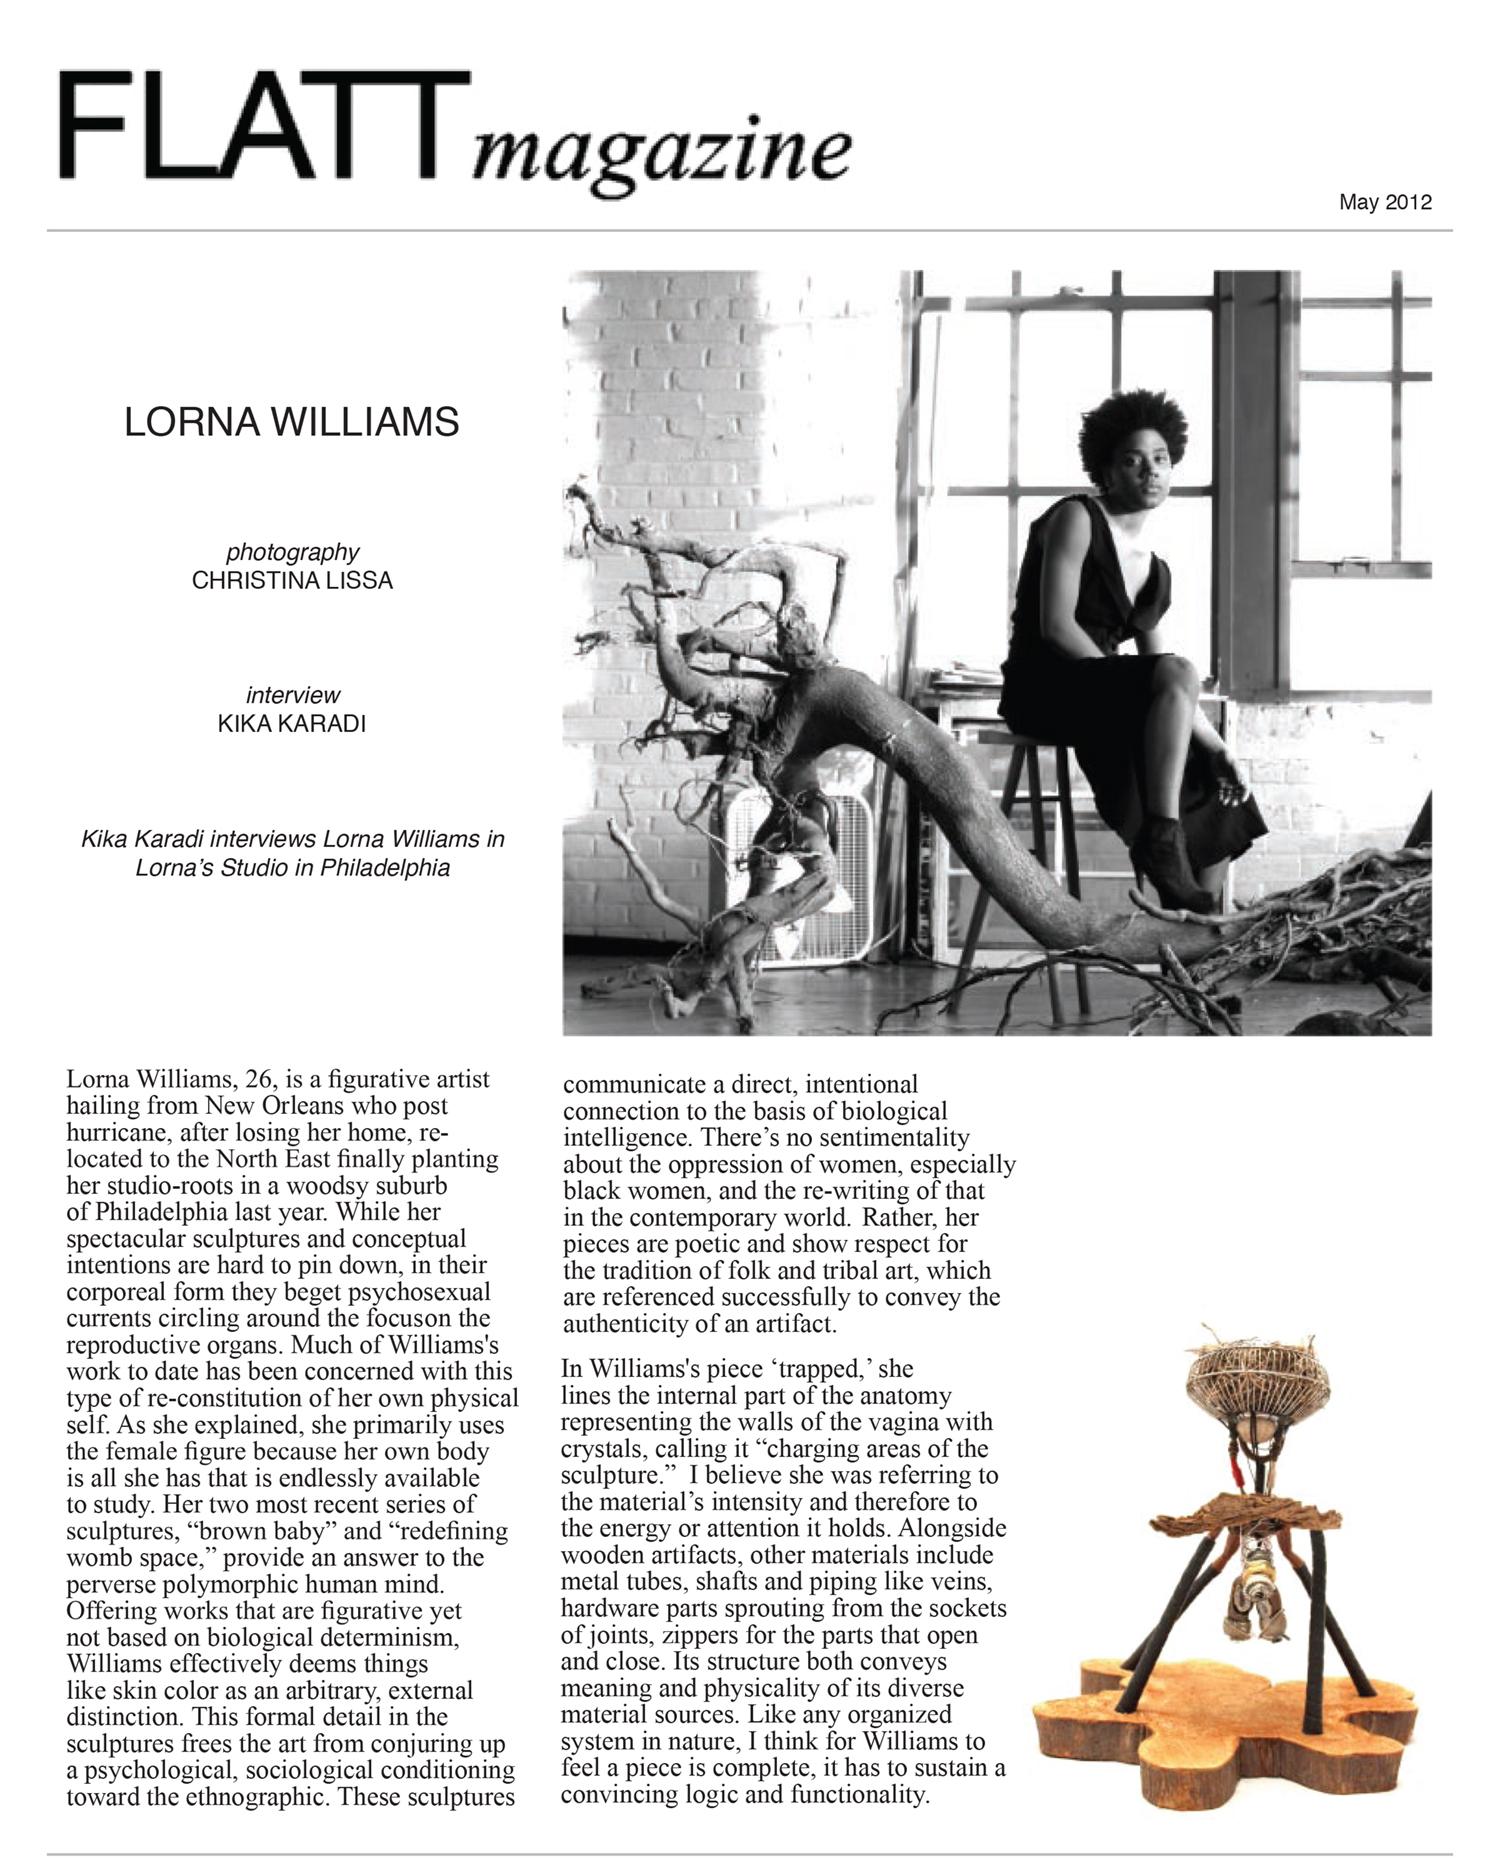 FlattMagazine MAy 2012.jpg